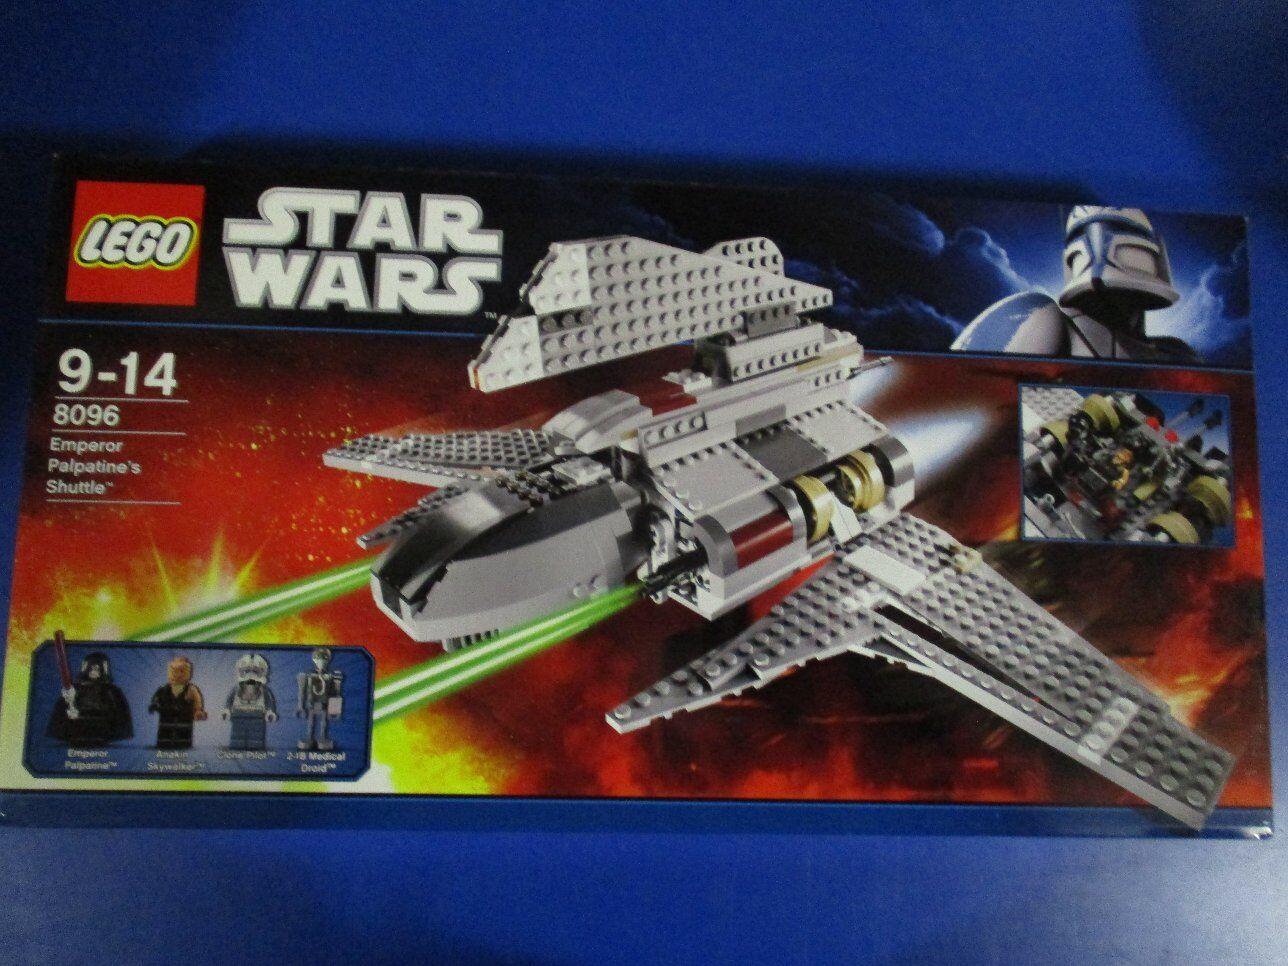 Lego  Star Wars 8096 Emperor Palpatine's Shuttle nouveau OP  Stade Cadeaux